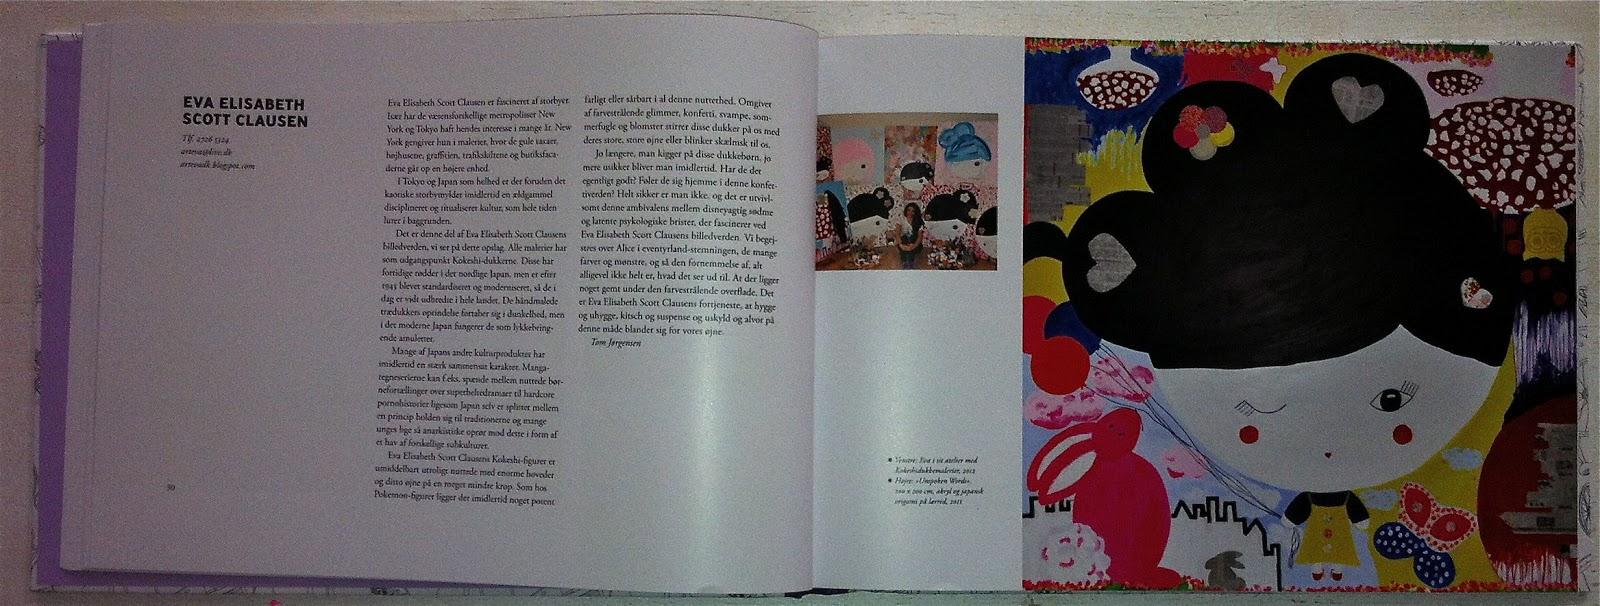 101 kunstnere 2012